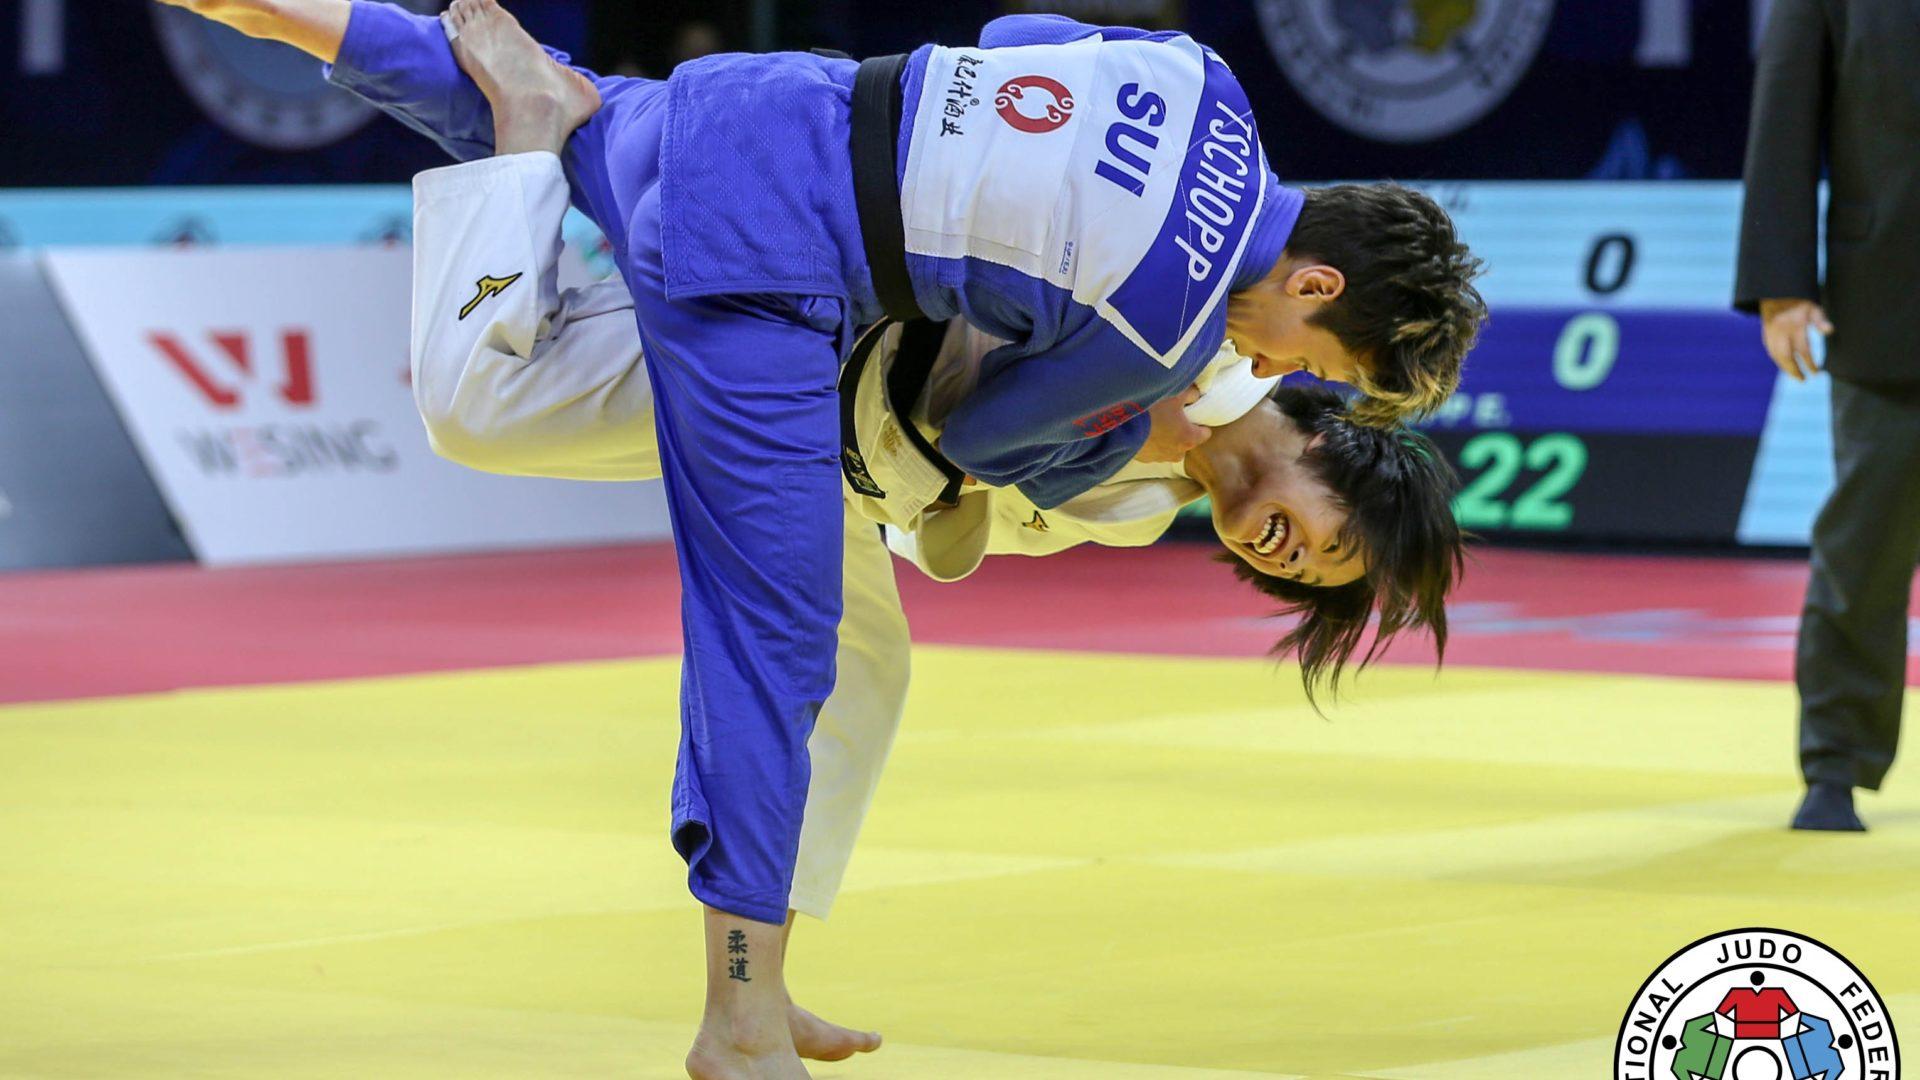 Uta Abe regresa a los tatamis con otro oro